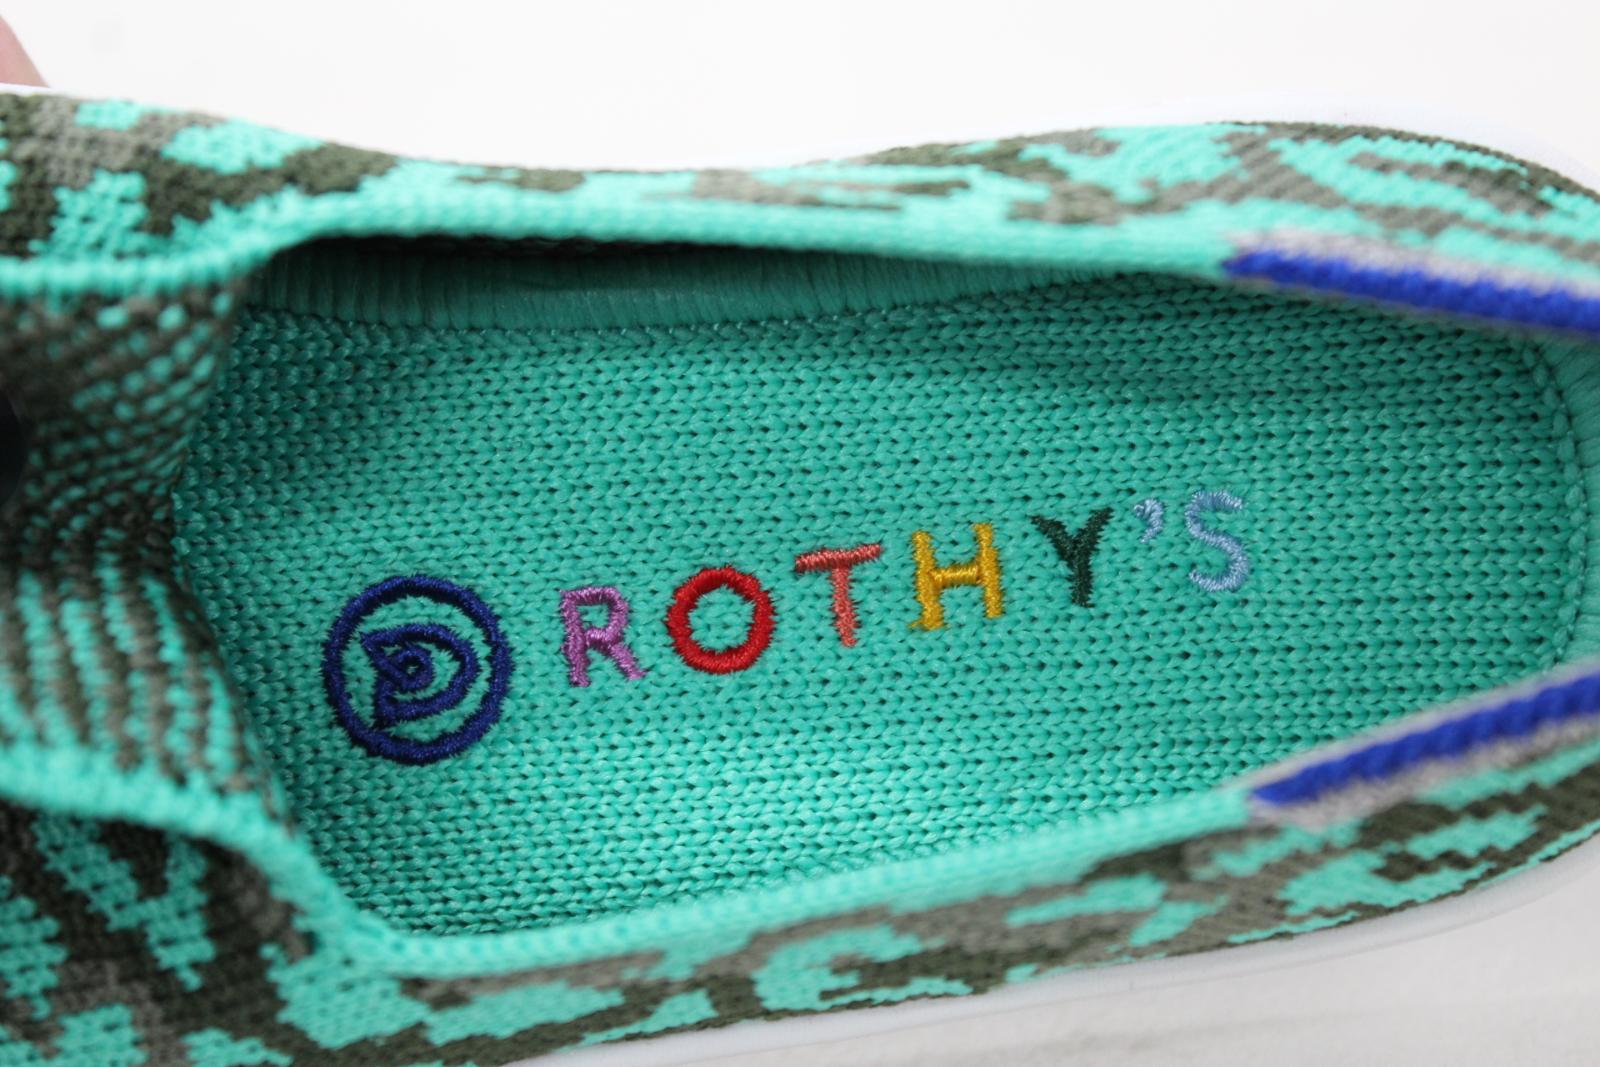 ROTHY'S Girls The Kids Sneaker Aqua Camo Spot Textile Shoes US10 UK9 BNIB 7